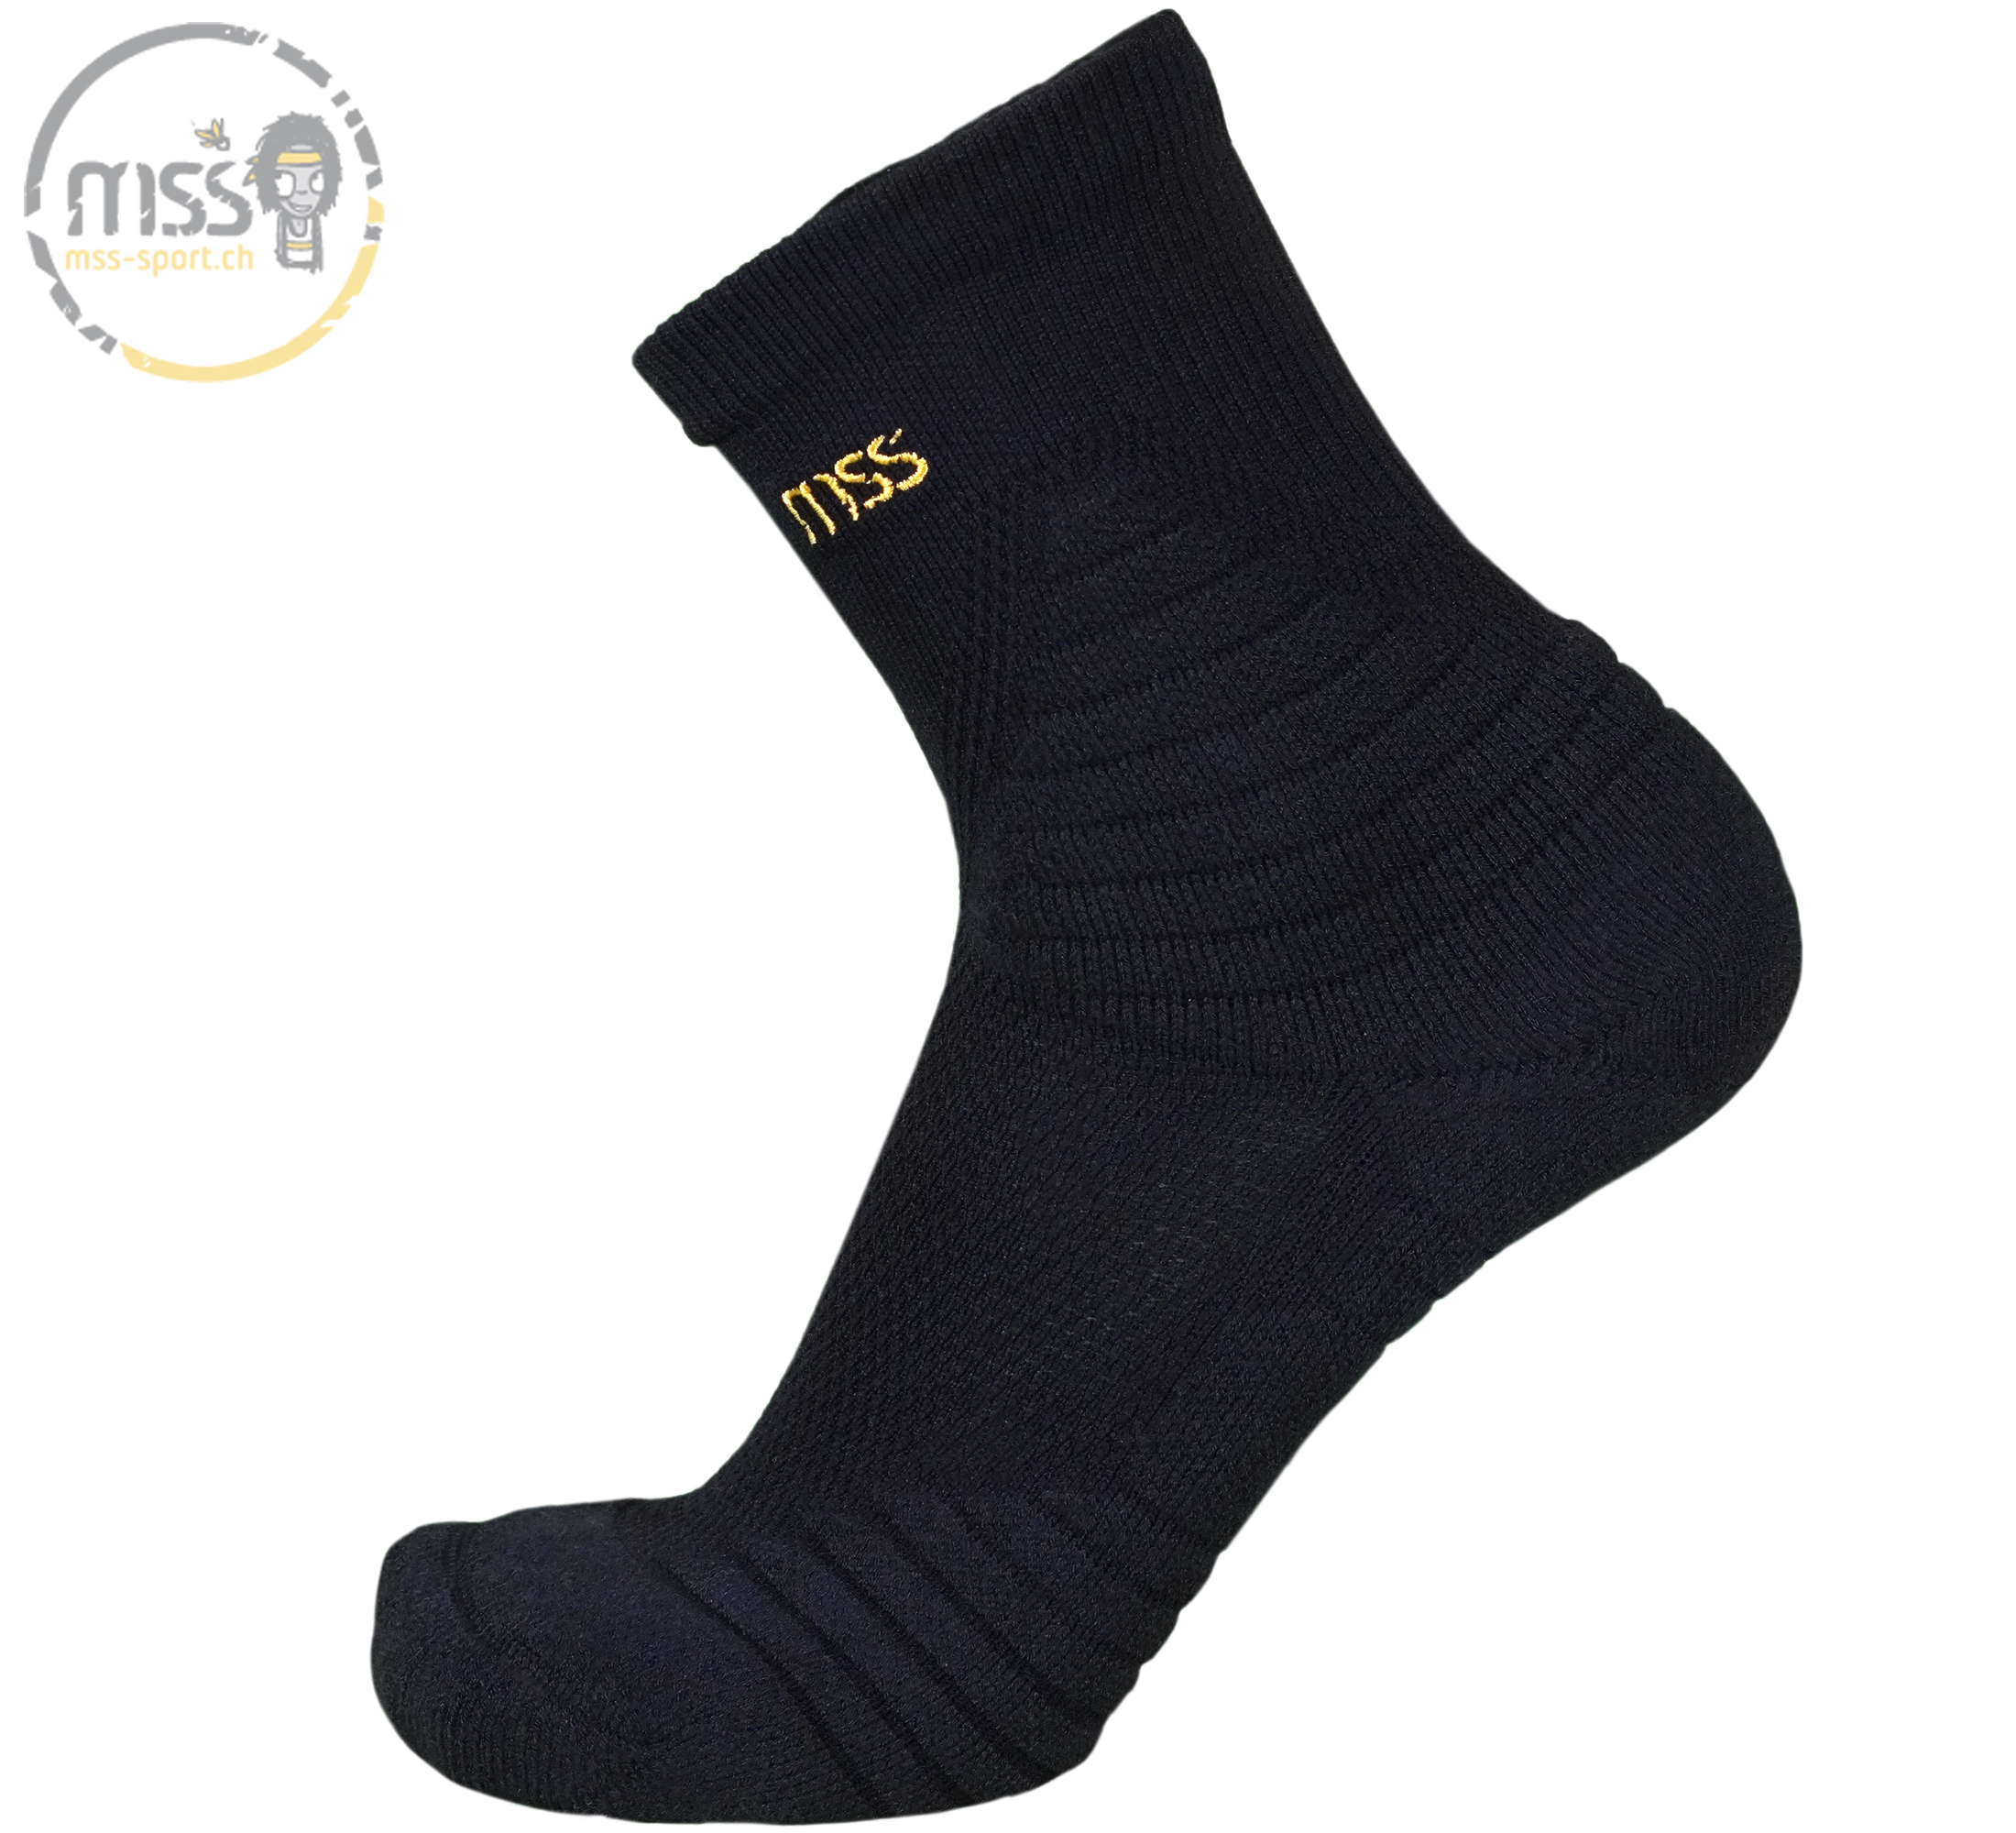 mss-socks Smash 5500 mid black